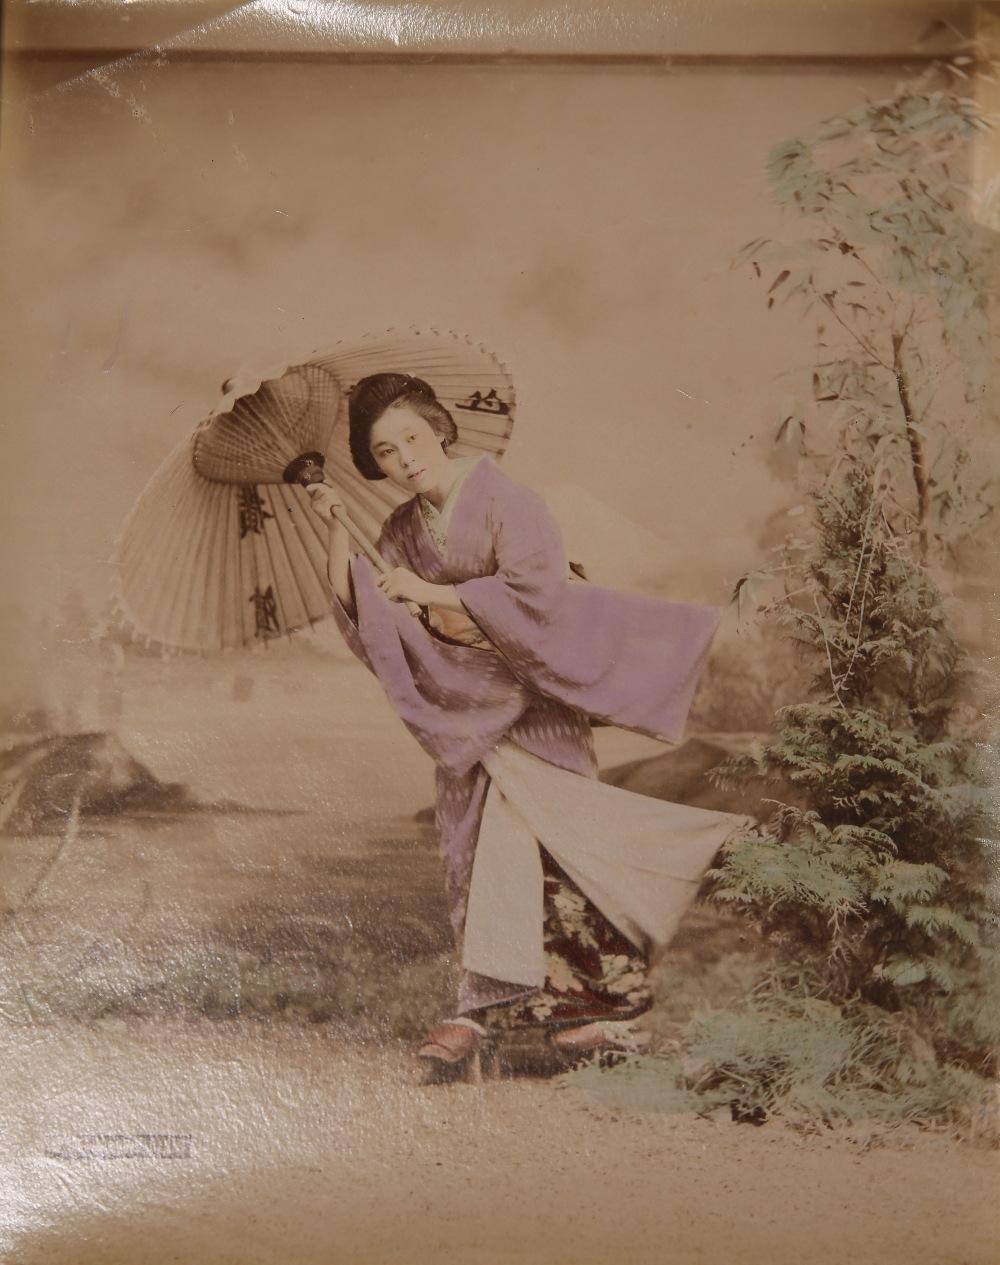 KUSAKABE KIMBEI (1841-1934) MEIJI PERIOD, 19TH CENTURY A Japanese hand-coloured albumen print